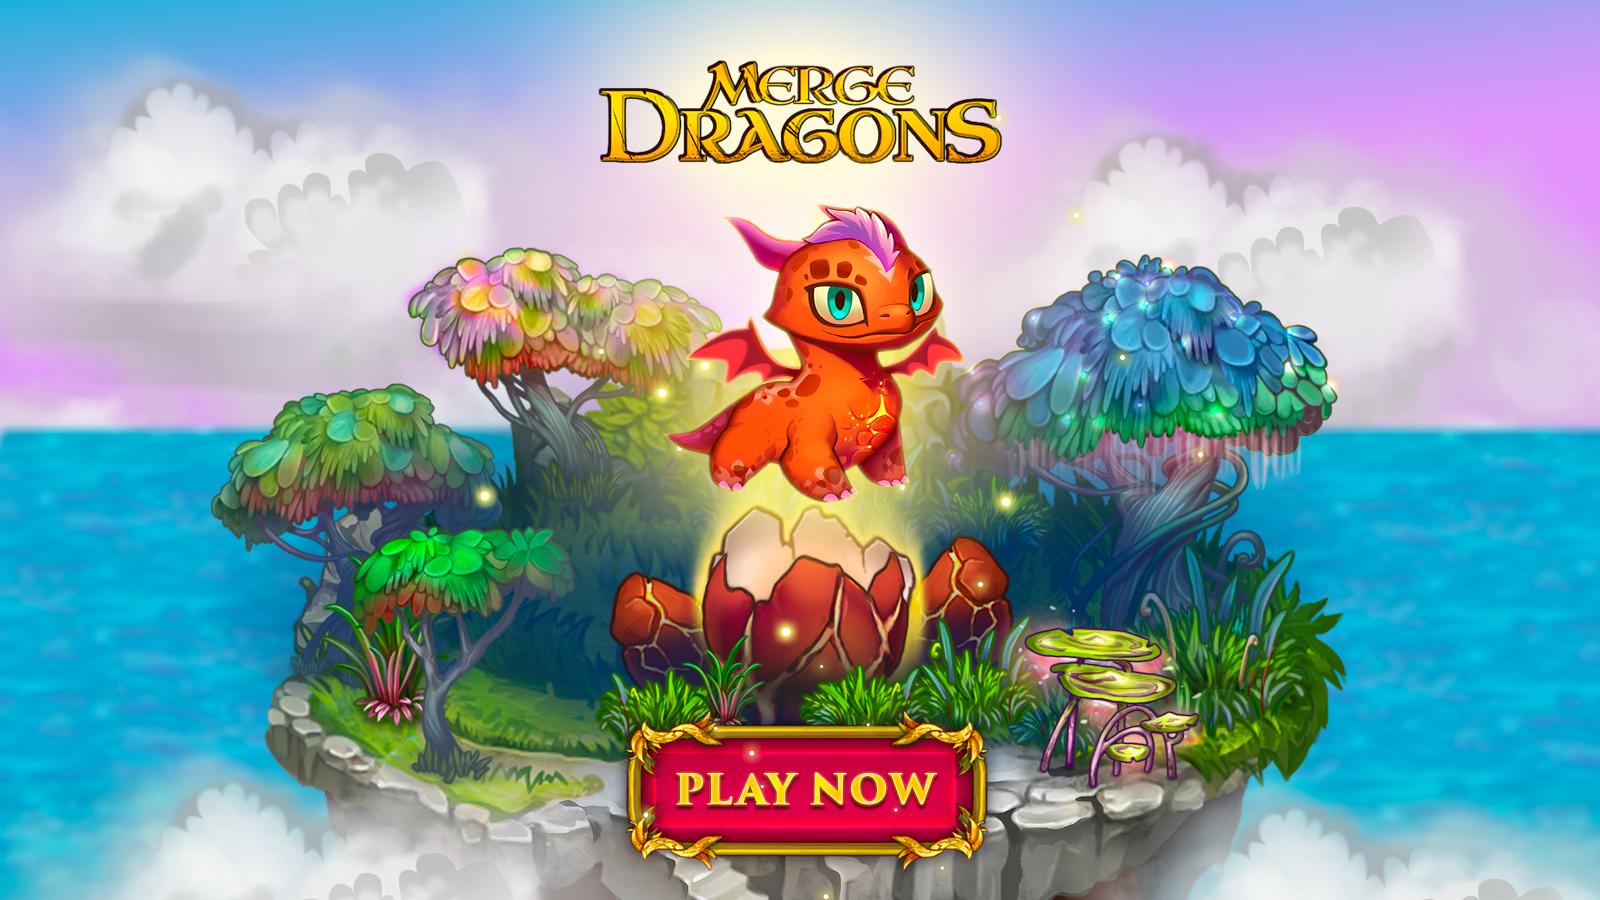 Merge-dragons-mod-apk